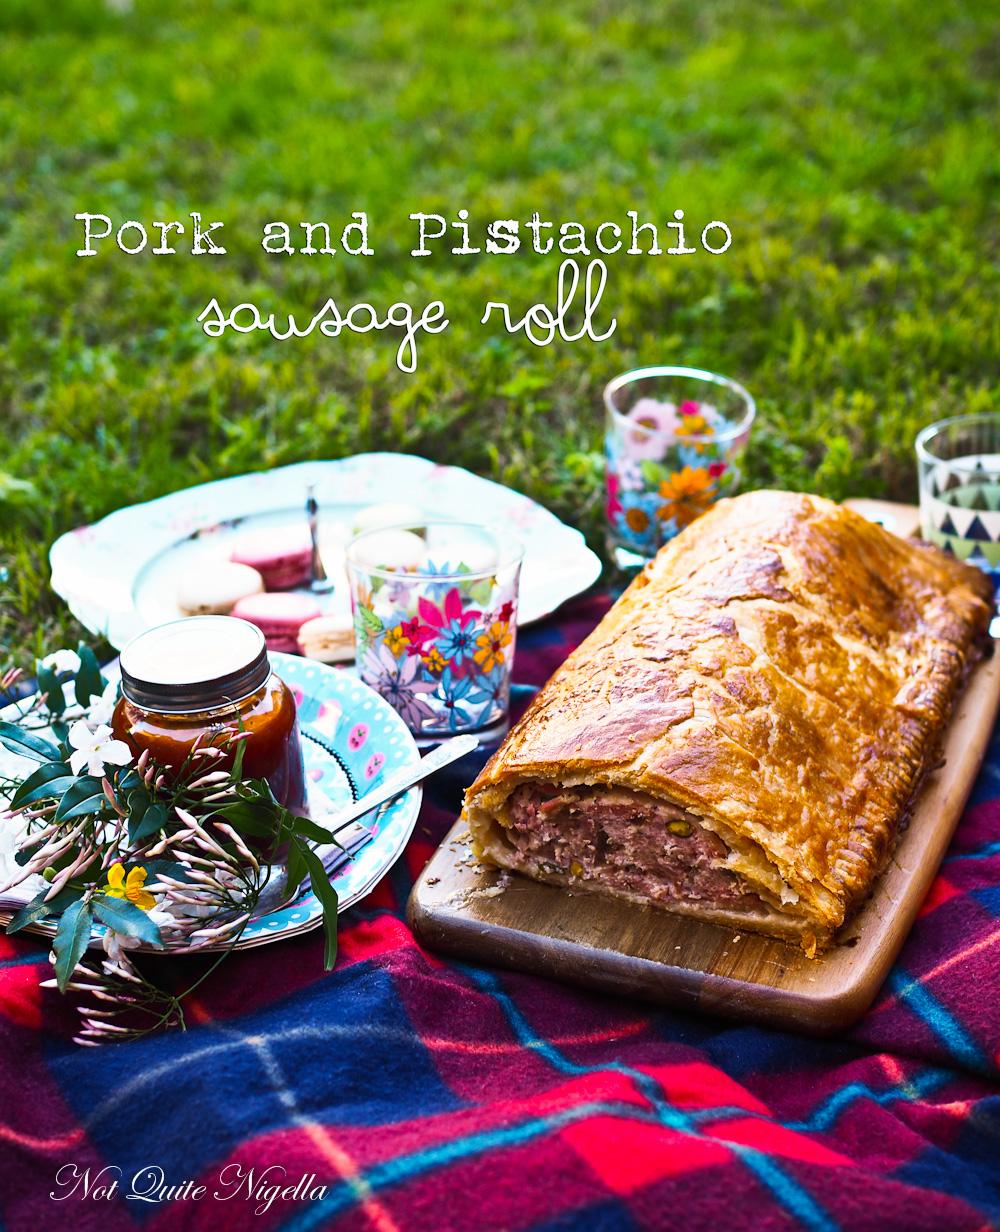 Pork and pistachio sausage roll